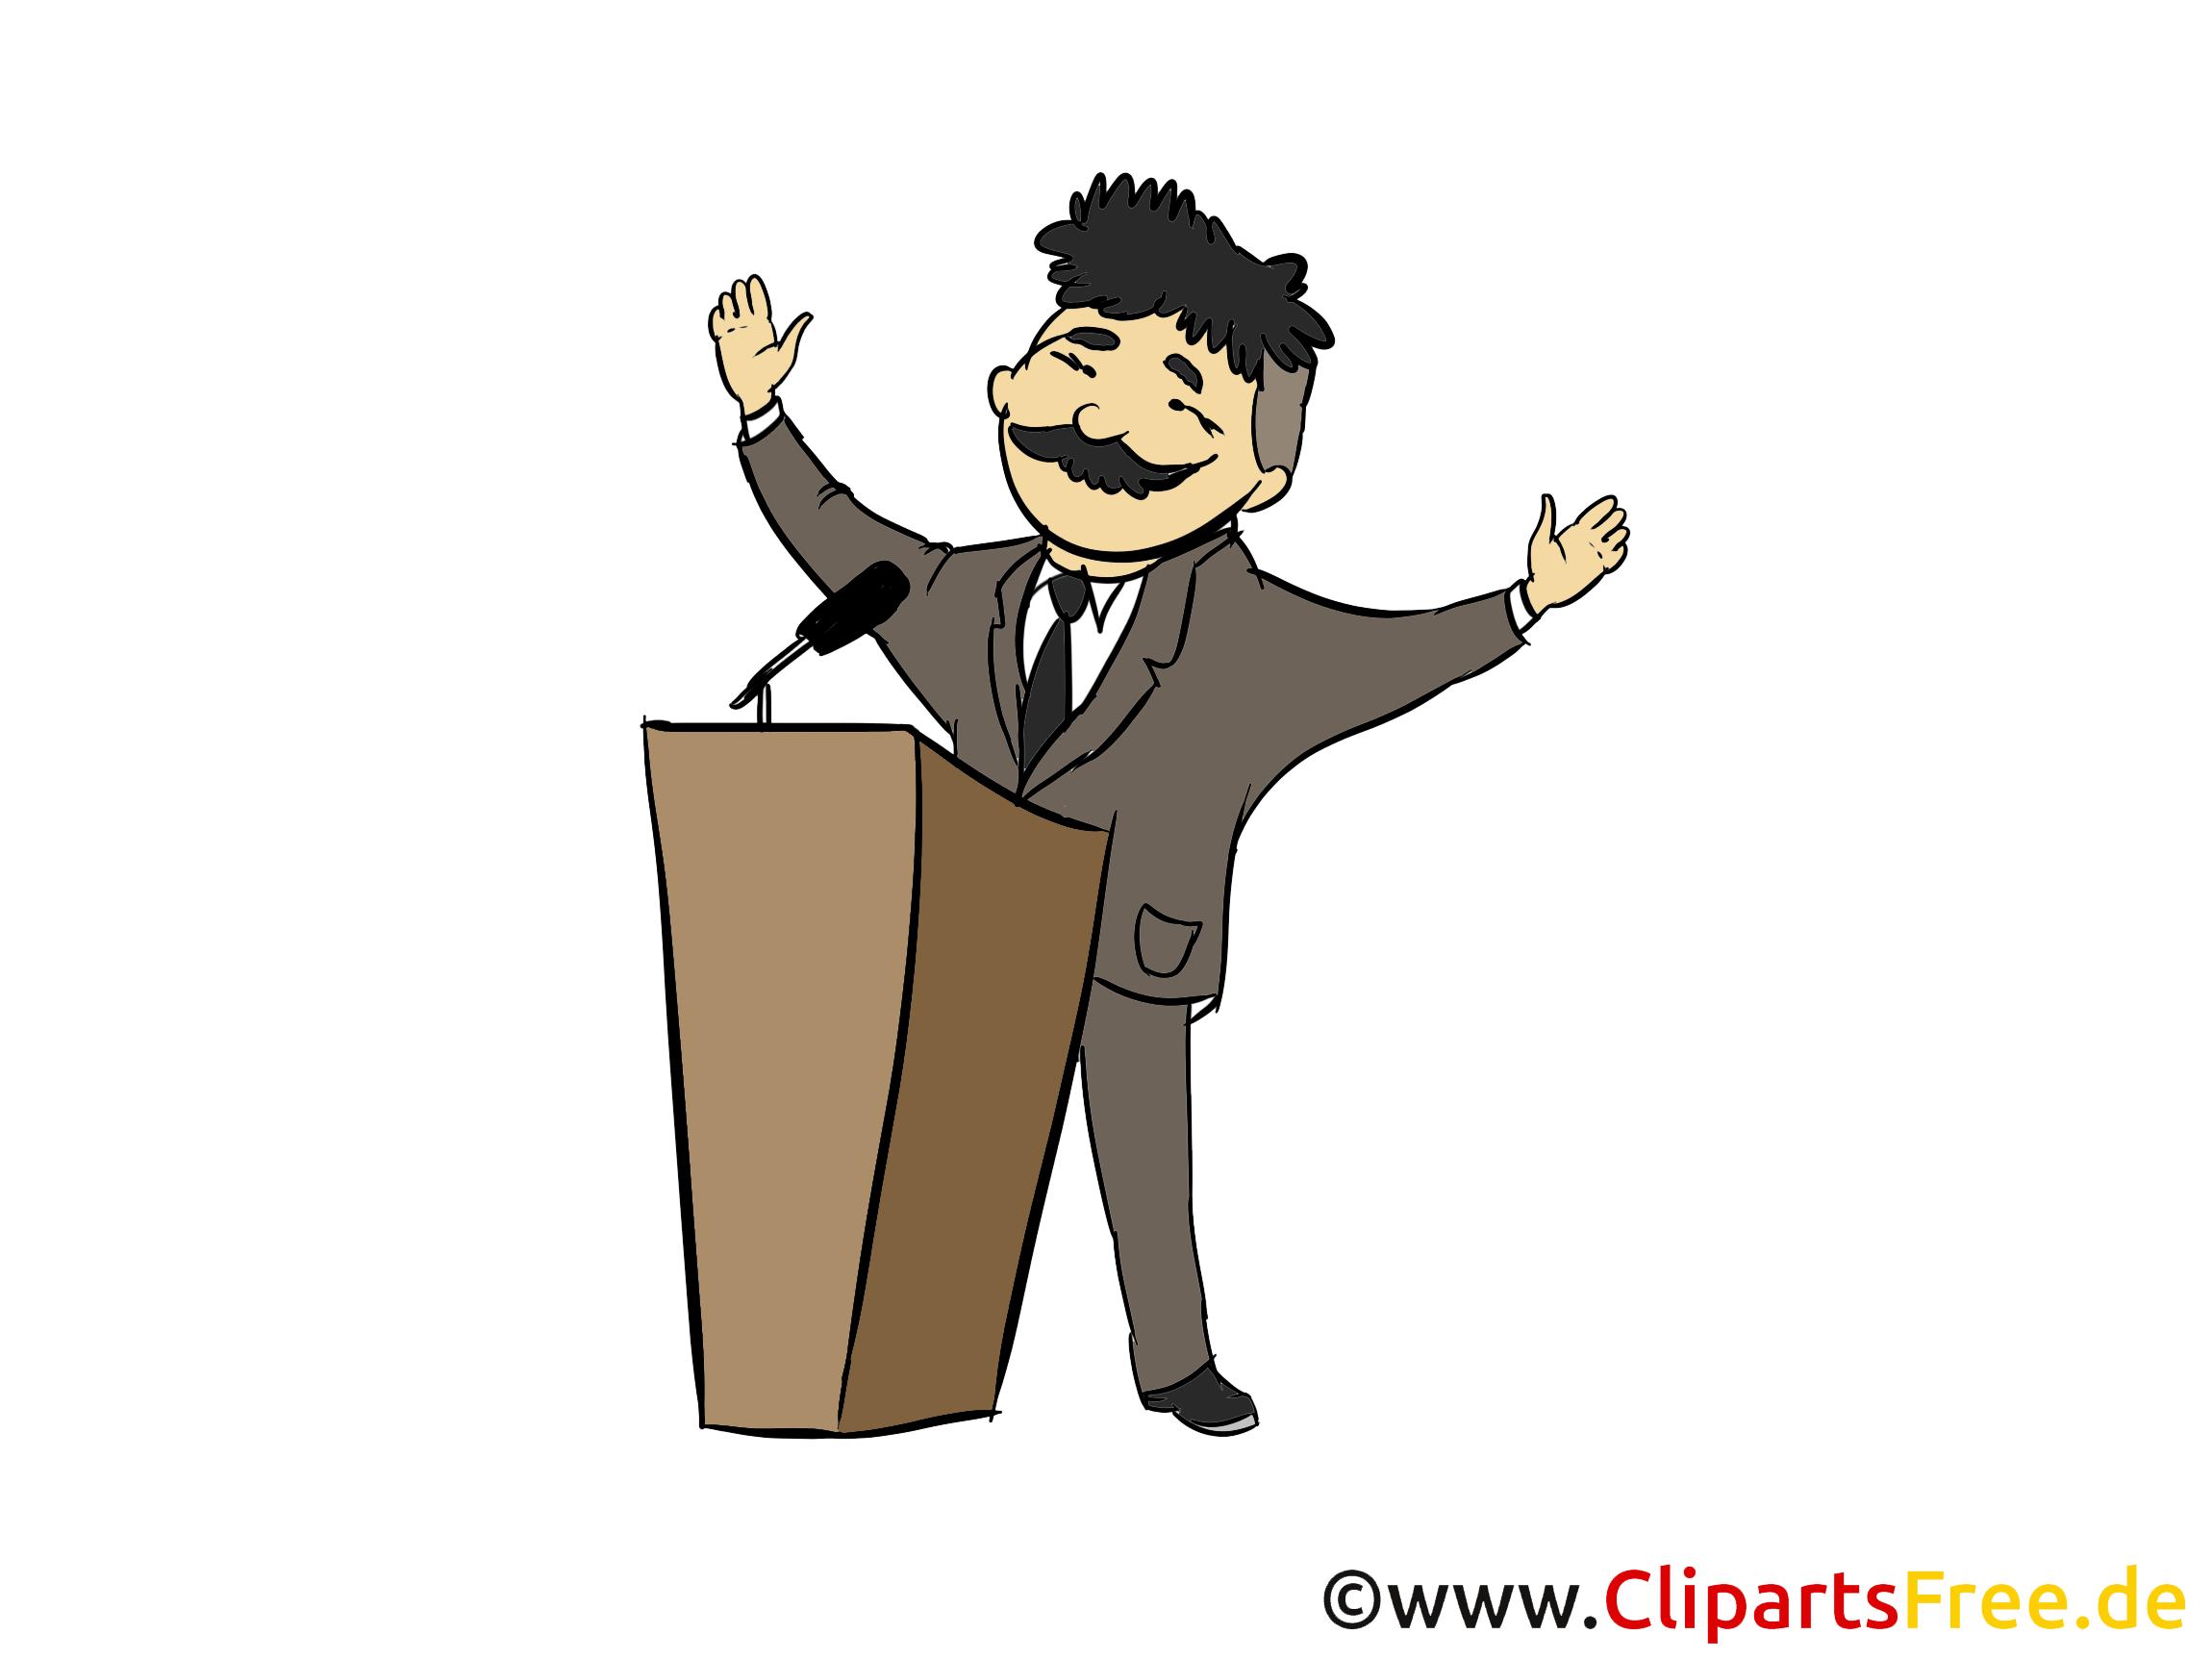 Bild mann clipart clipart freeuse Clipart wahlen - ClipartFest clipart freeuse